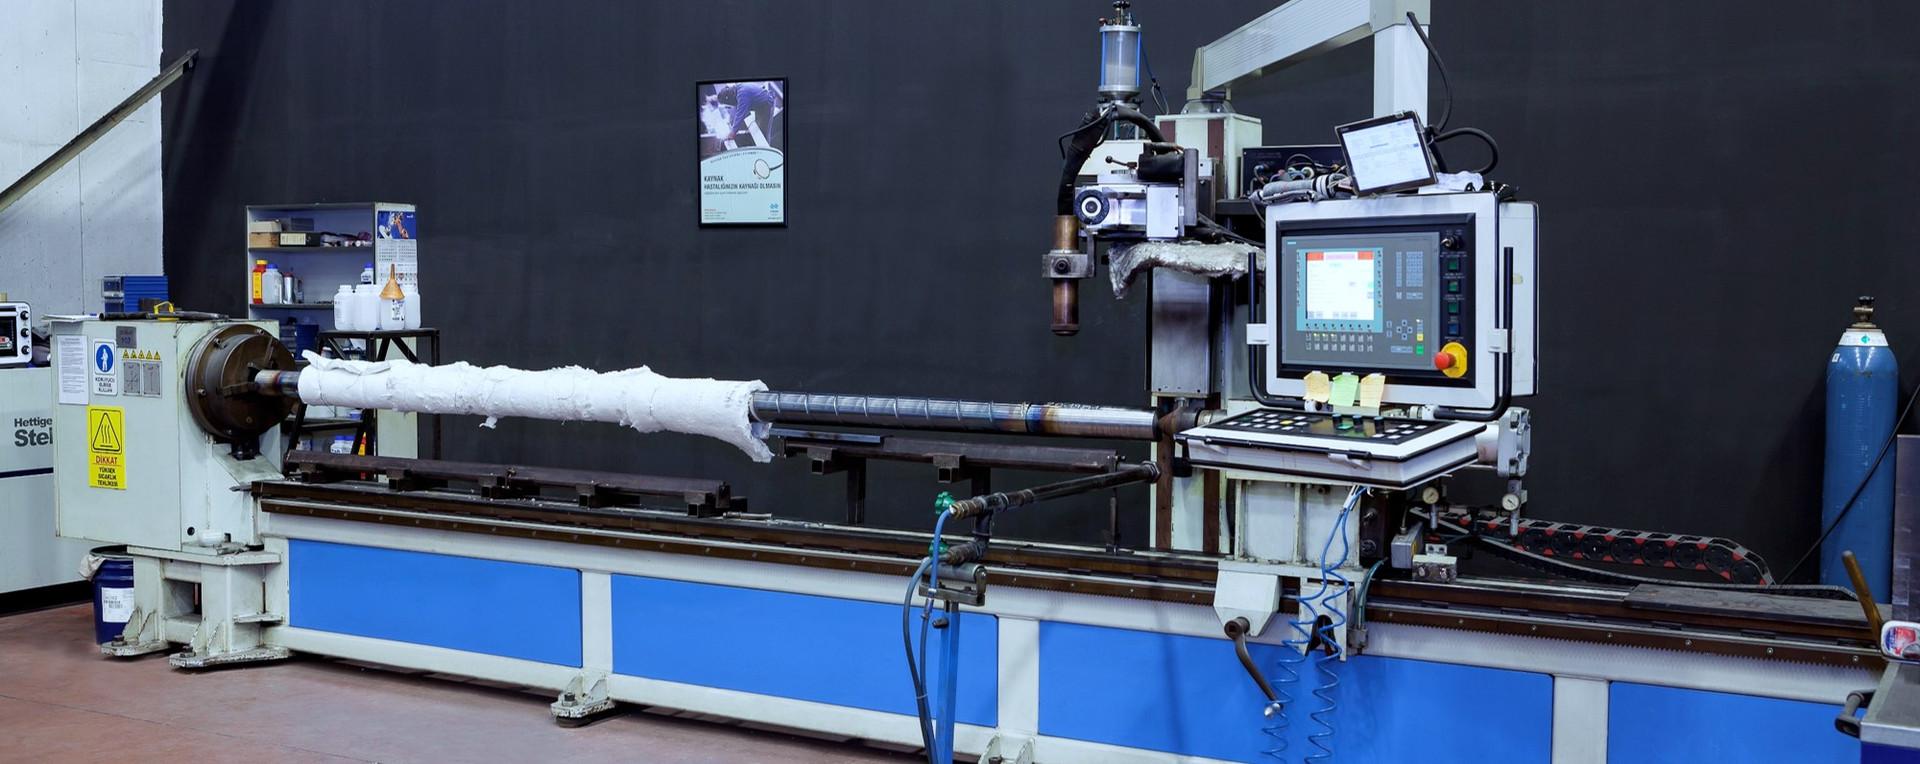 CNC PTA WELDING MACHINE